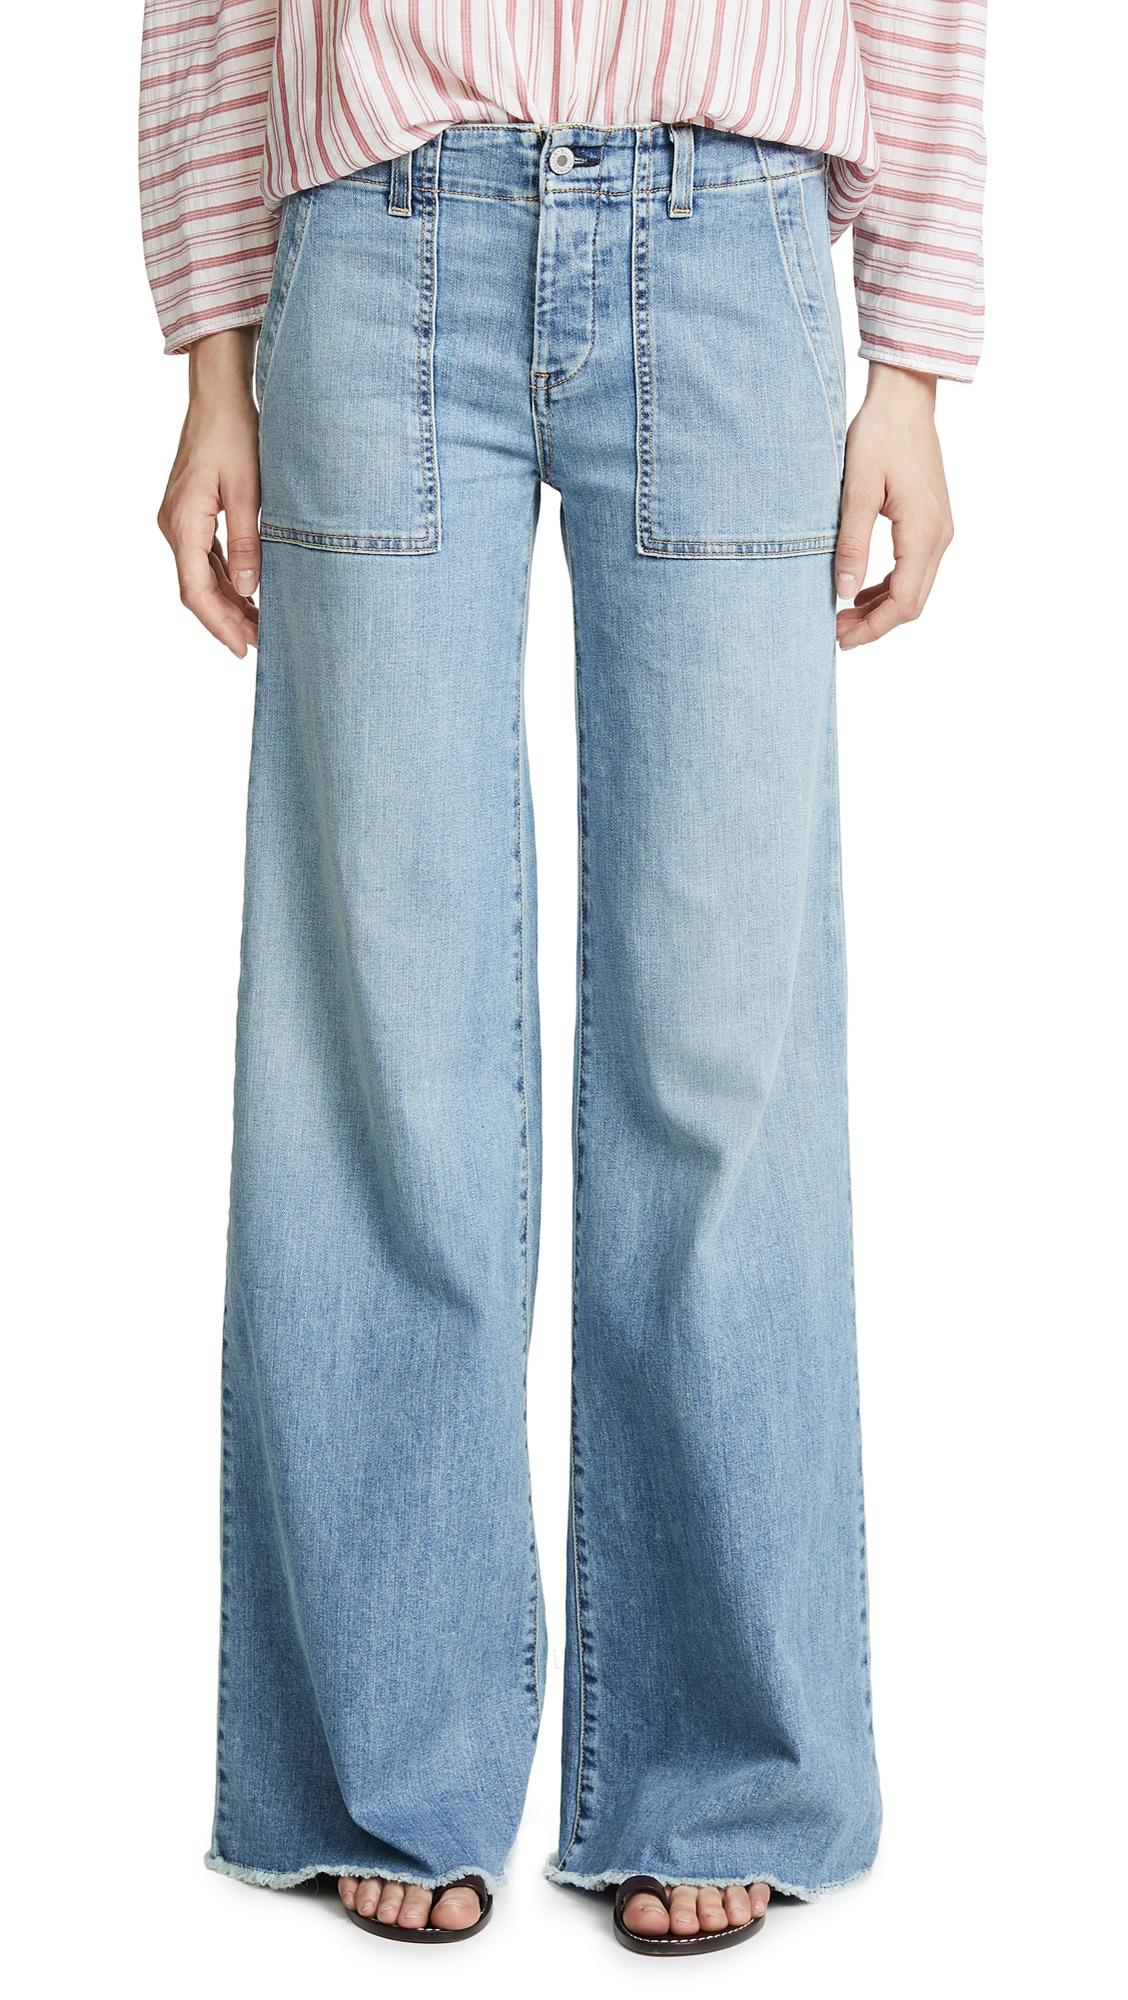 Nili Lotan Soft Cargo Jeans In Vintage Wash